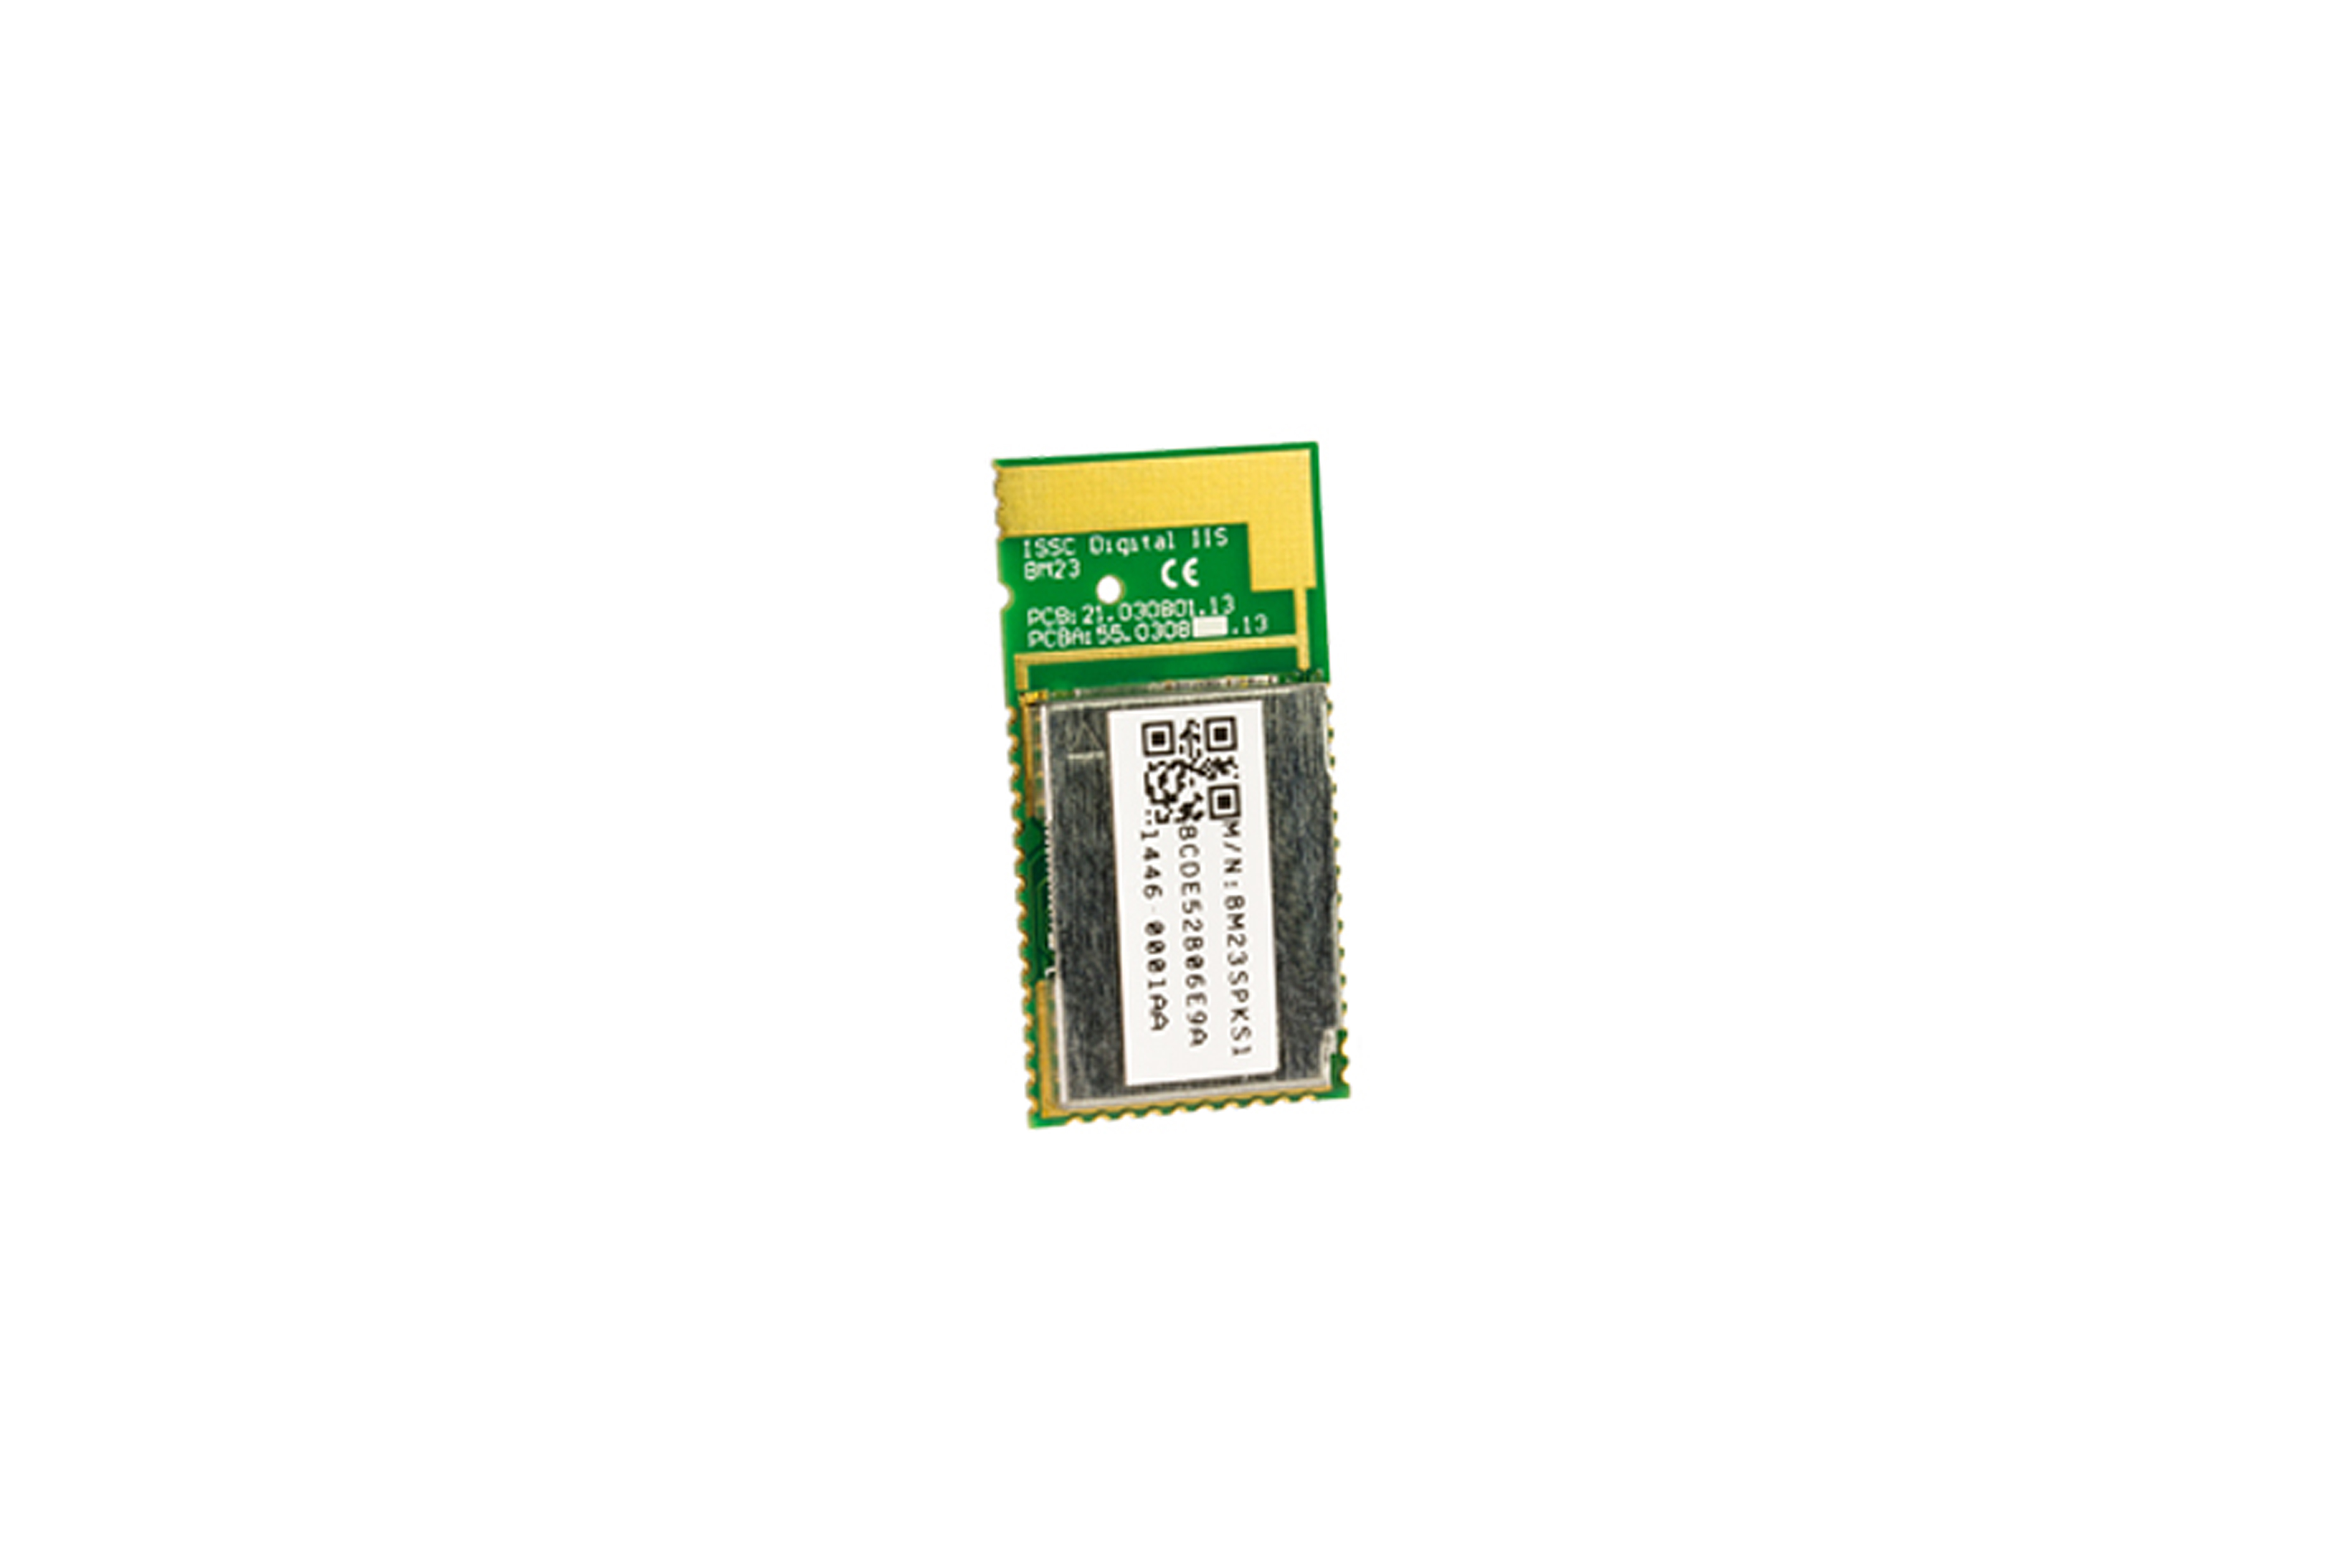 Bluetooth 4.1 BDR/EDR klasse 2-module